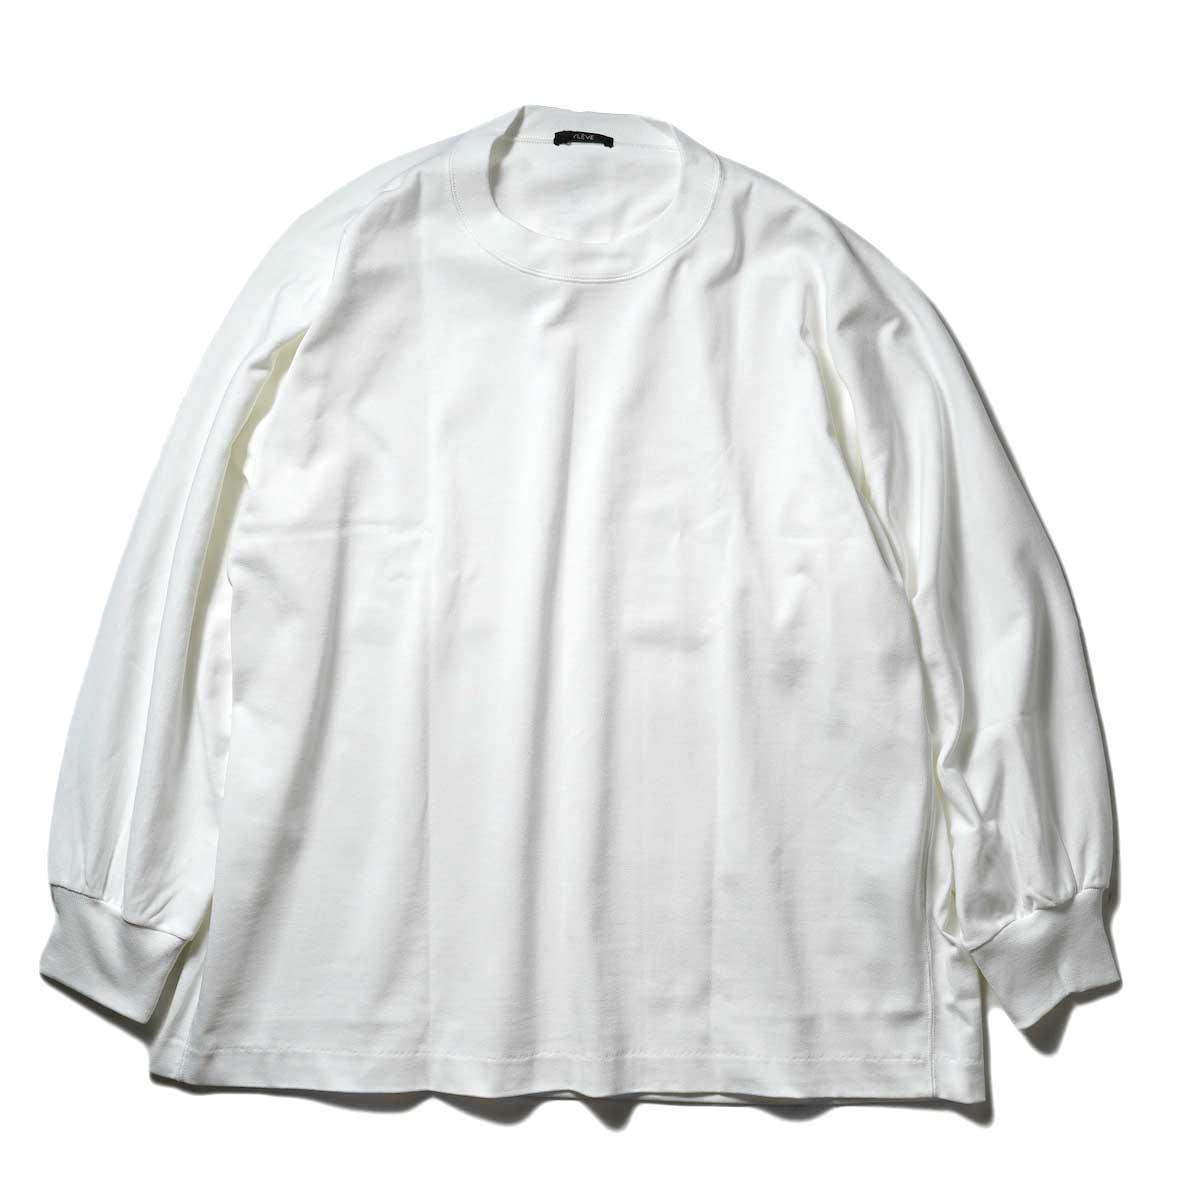 YLEVE / TWIST YARN COTTON BIG P/O (White) 正面